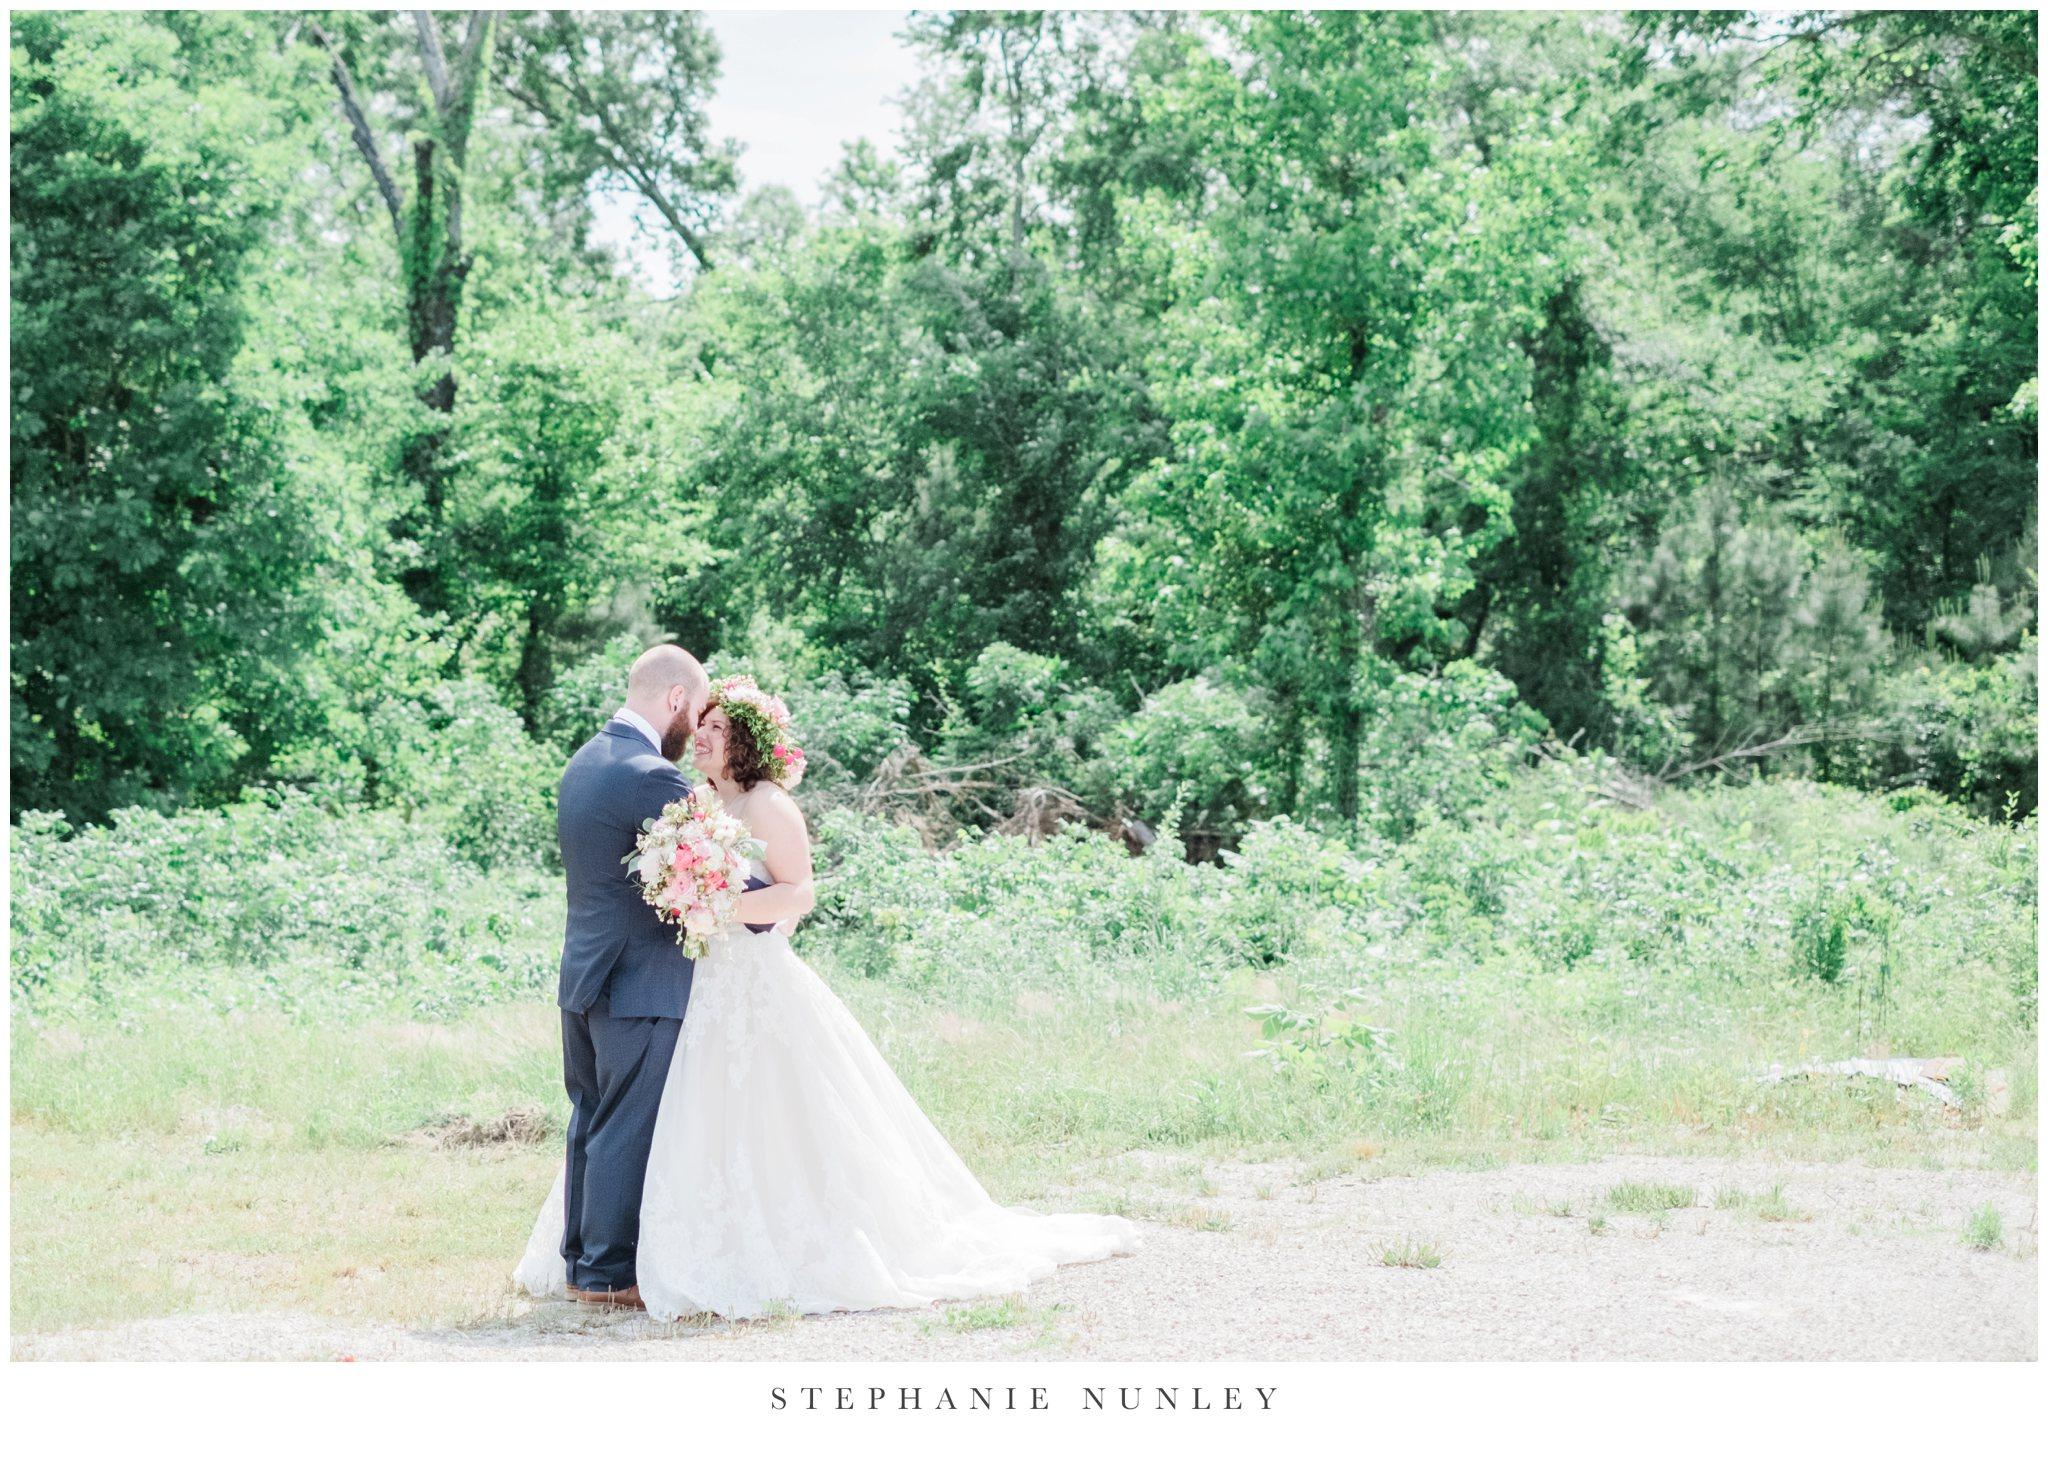 romantic-outdoor-wedding-with-flower-crown-0070.jpg